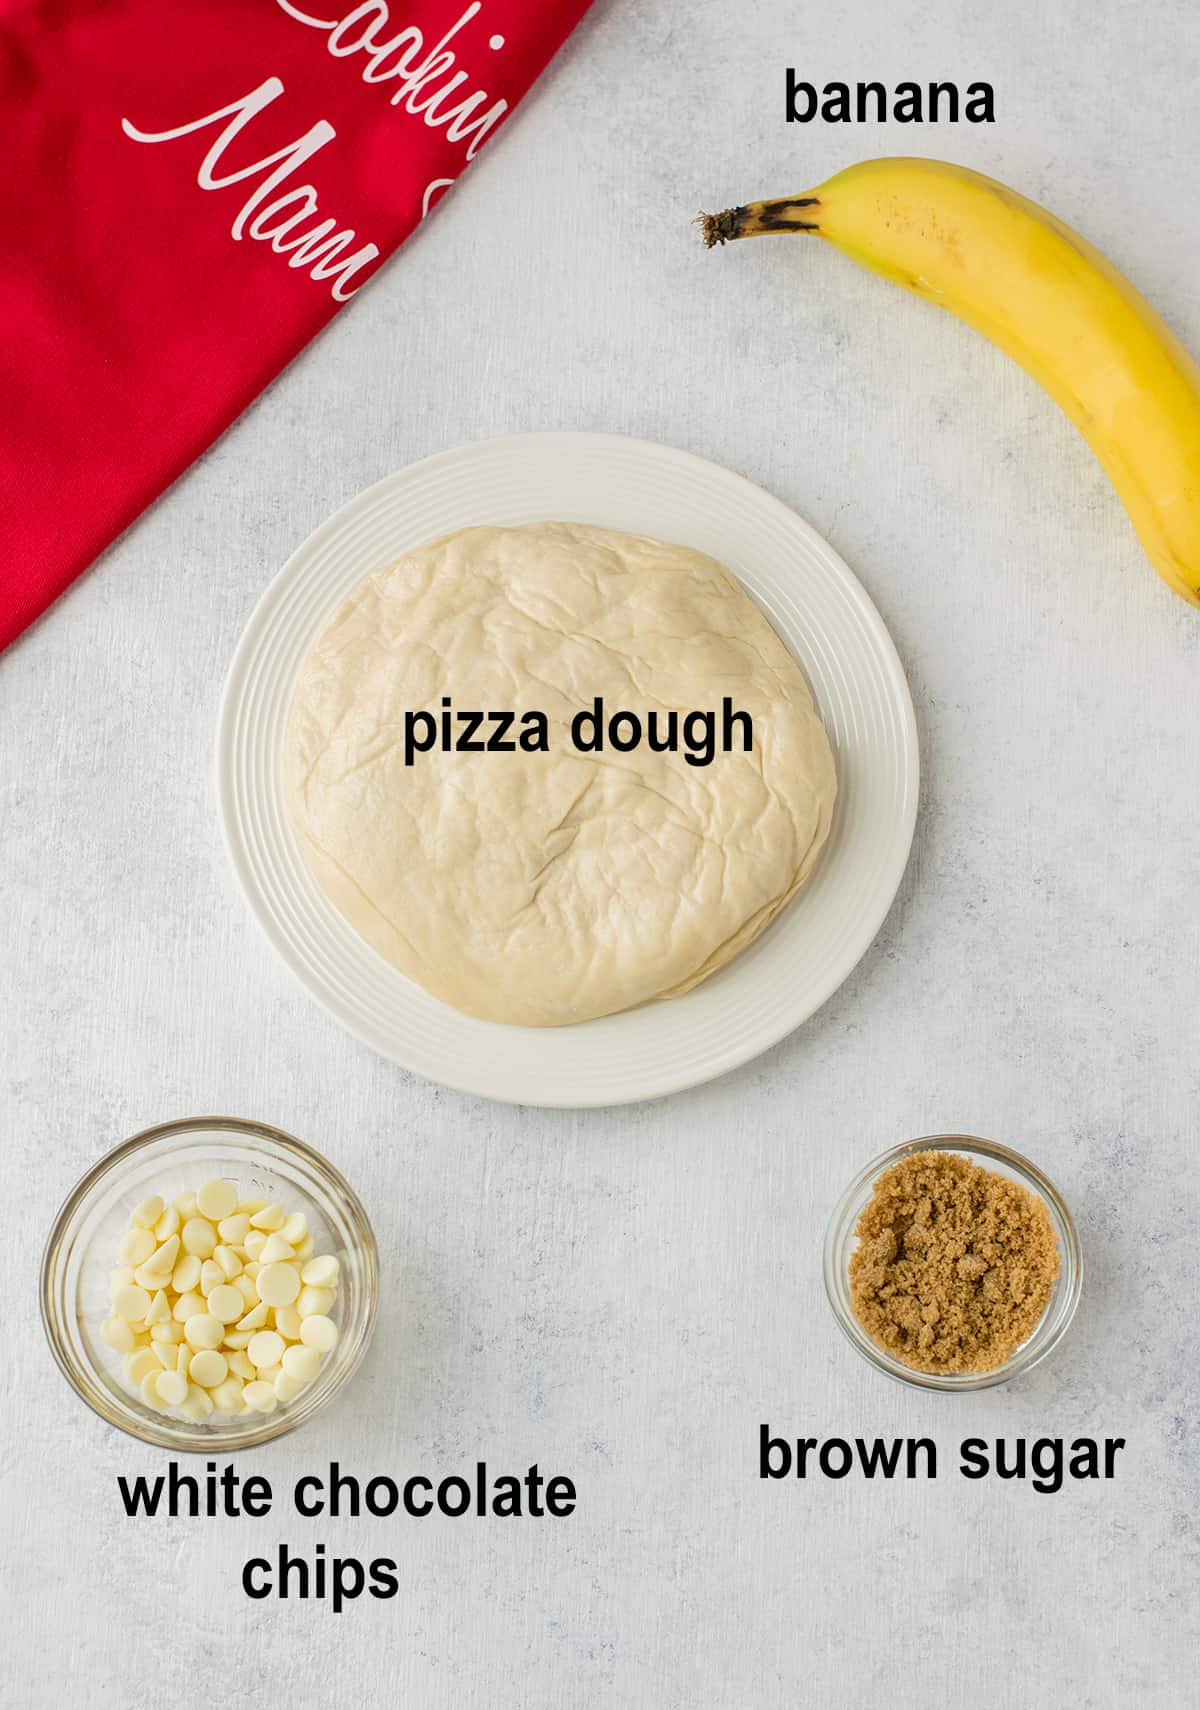 dough, banana, brown sugar, white chocolate chips